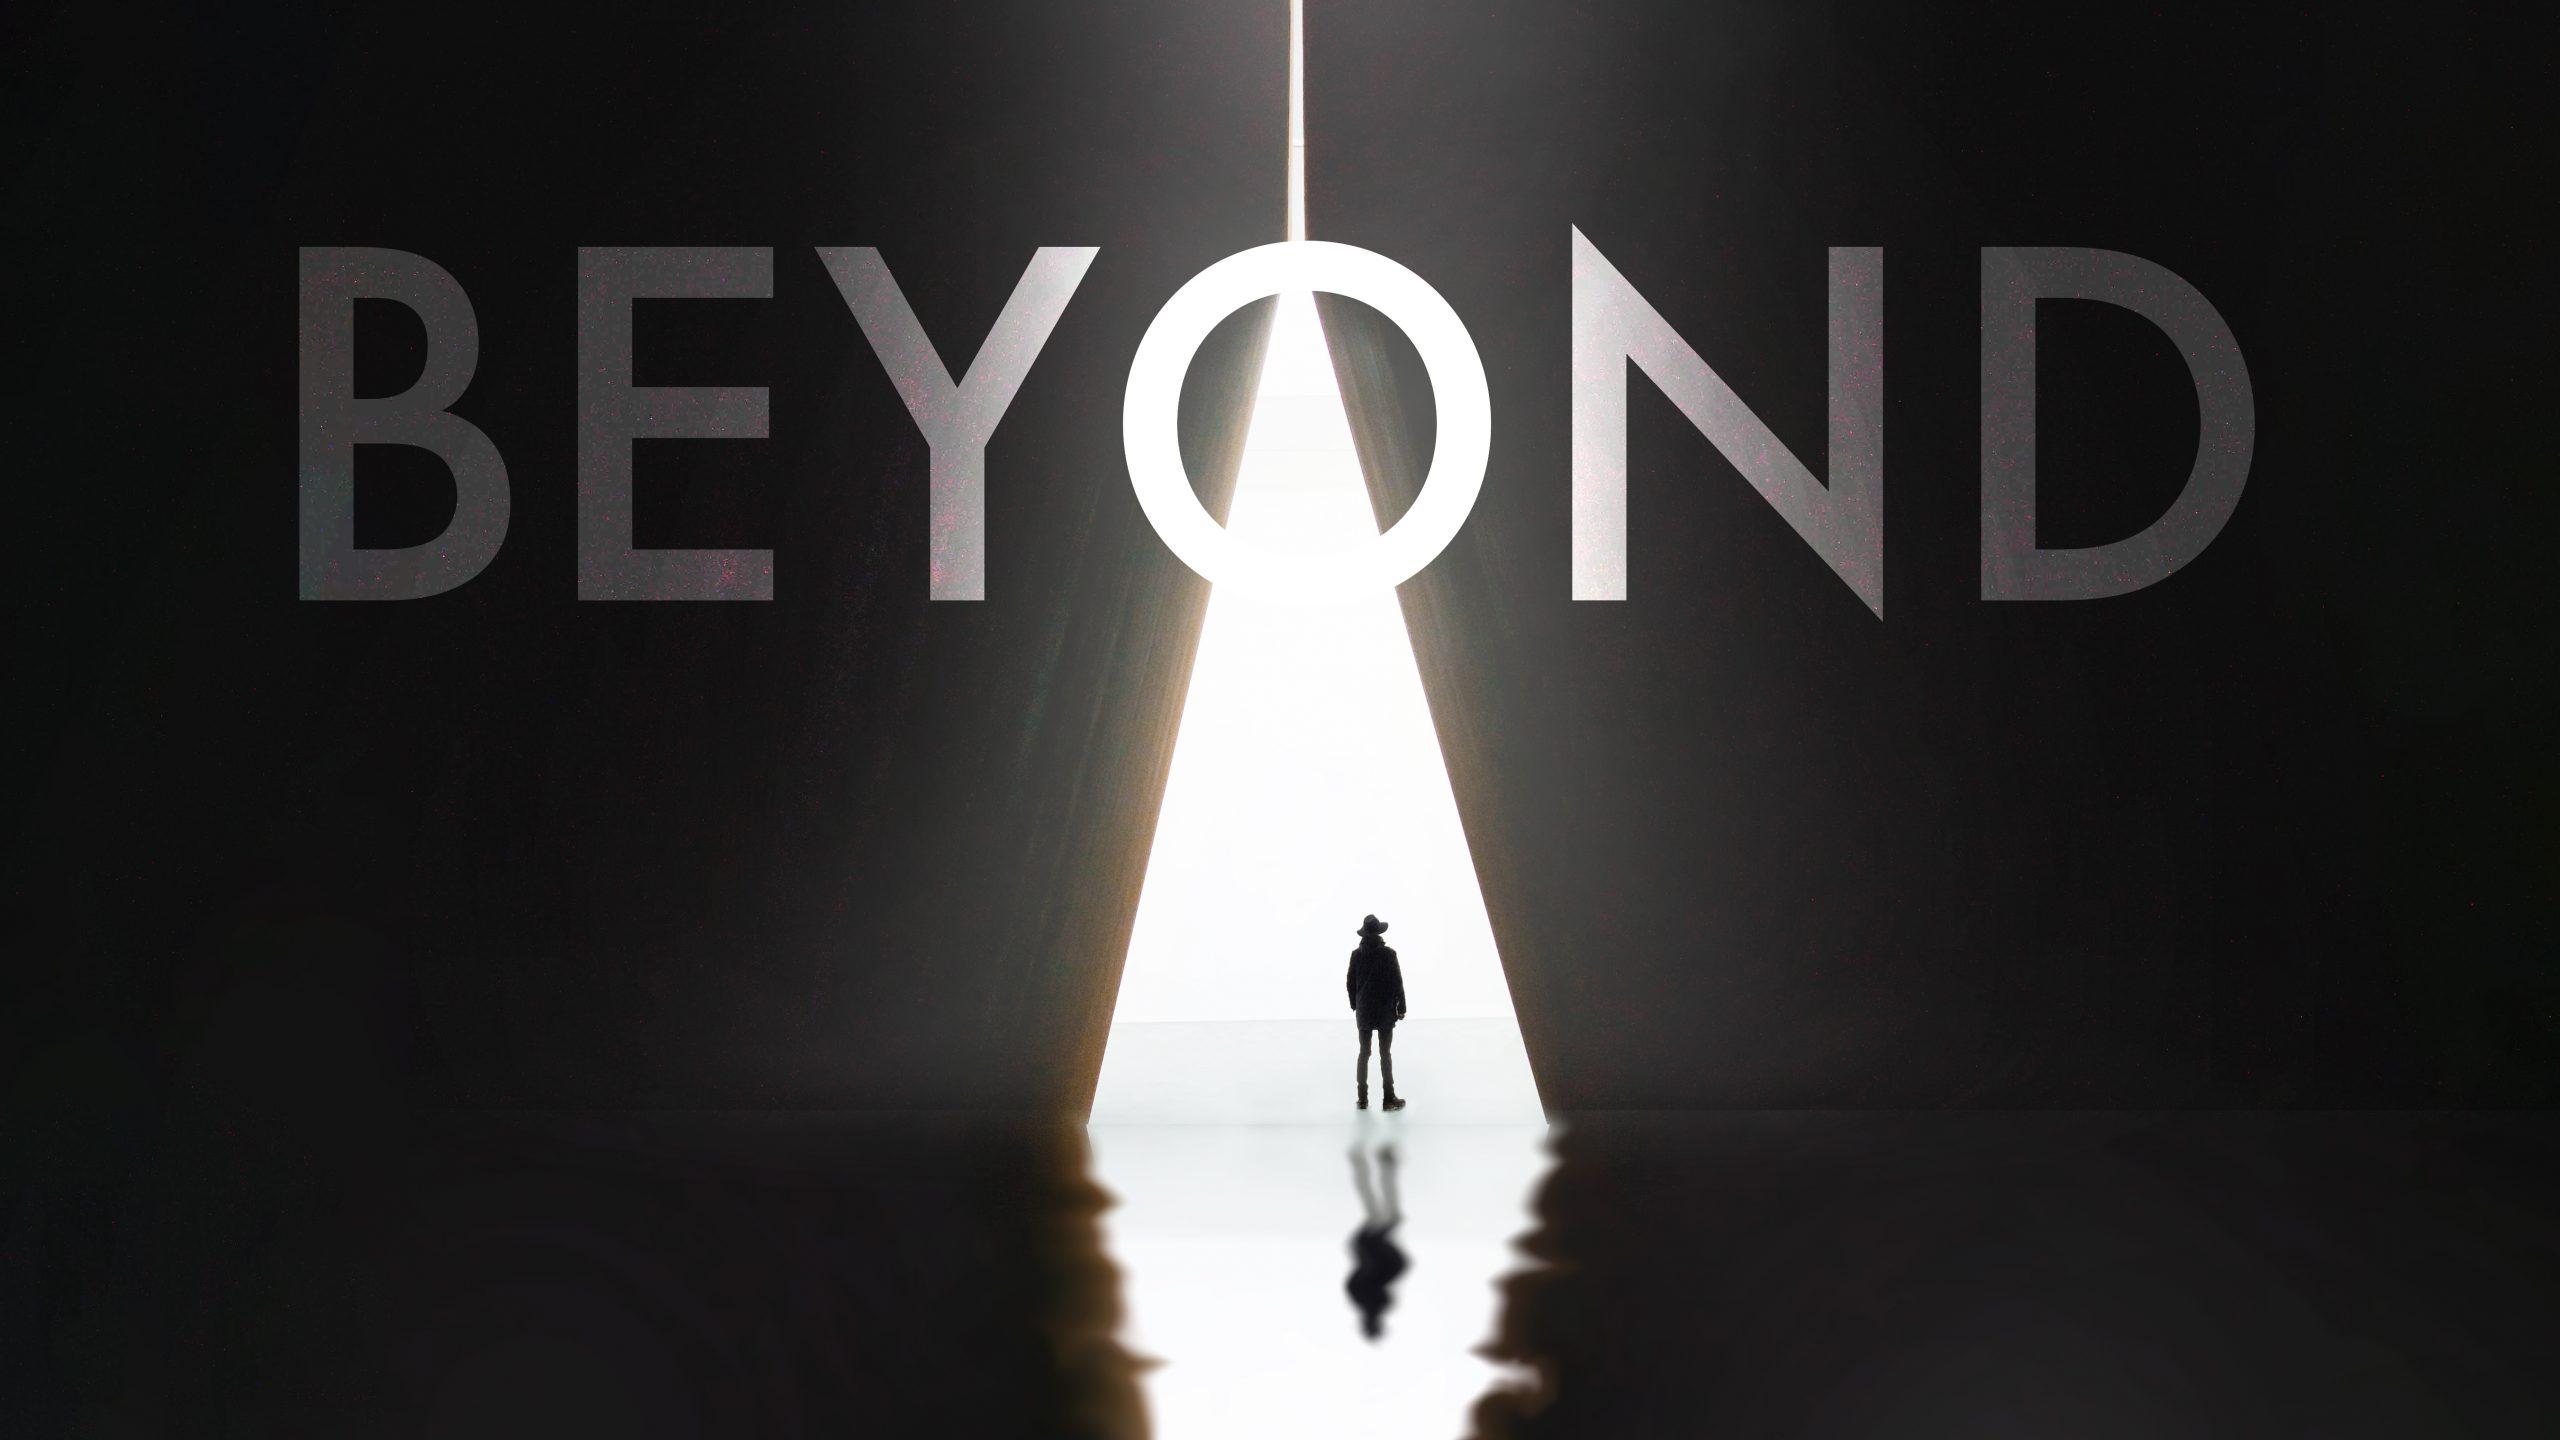 Vision Sunday – Beyond